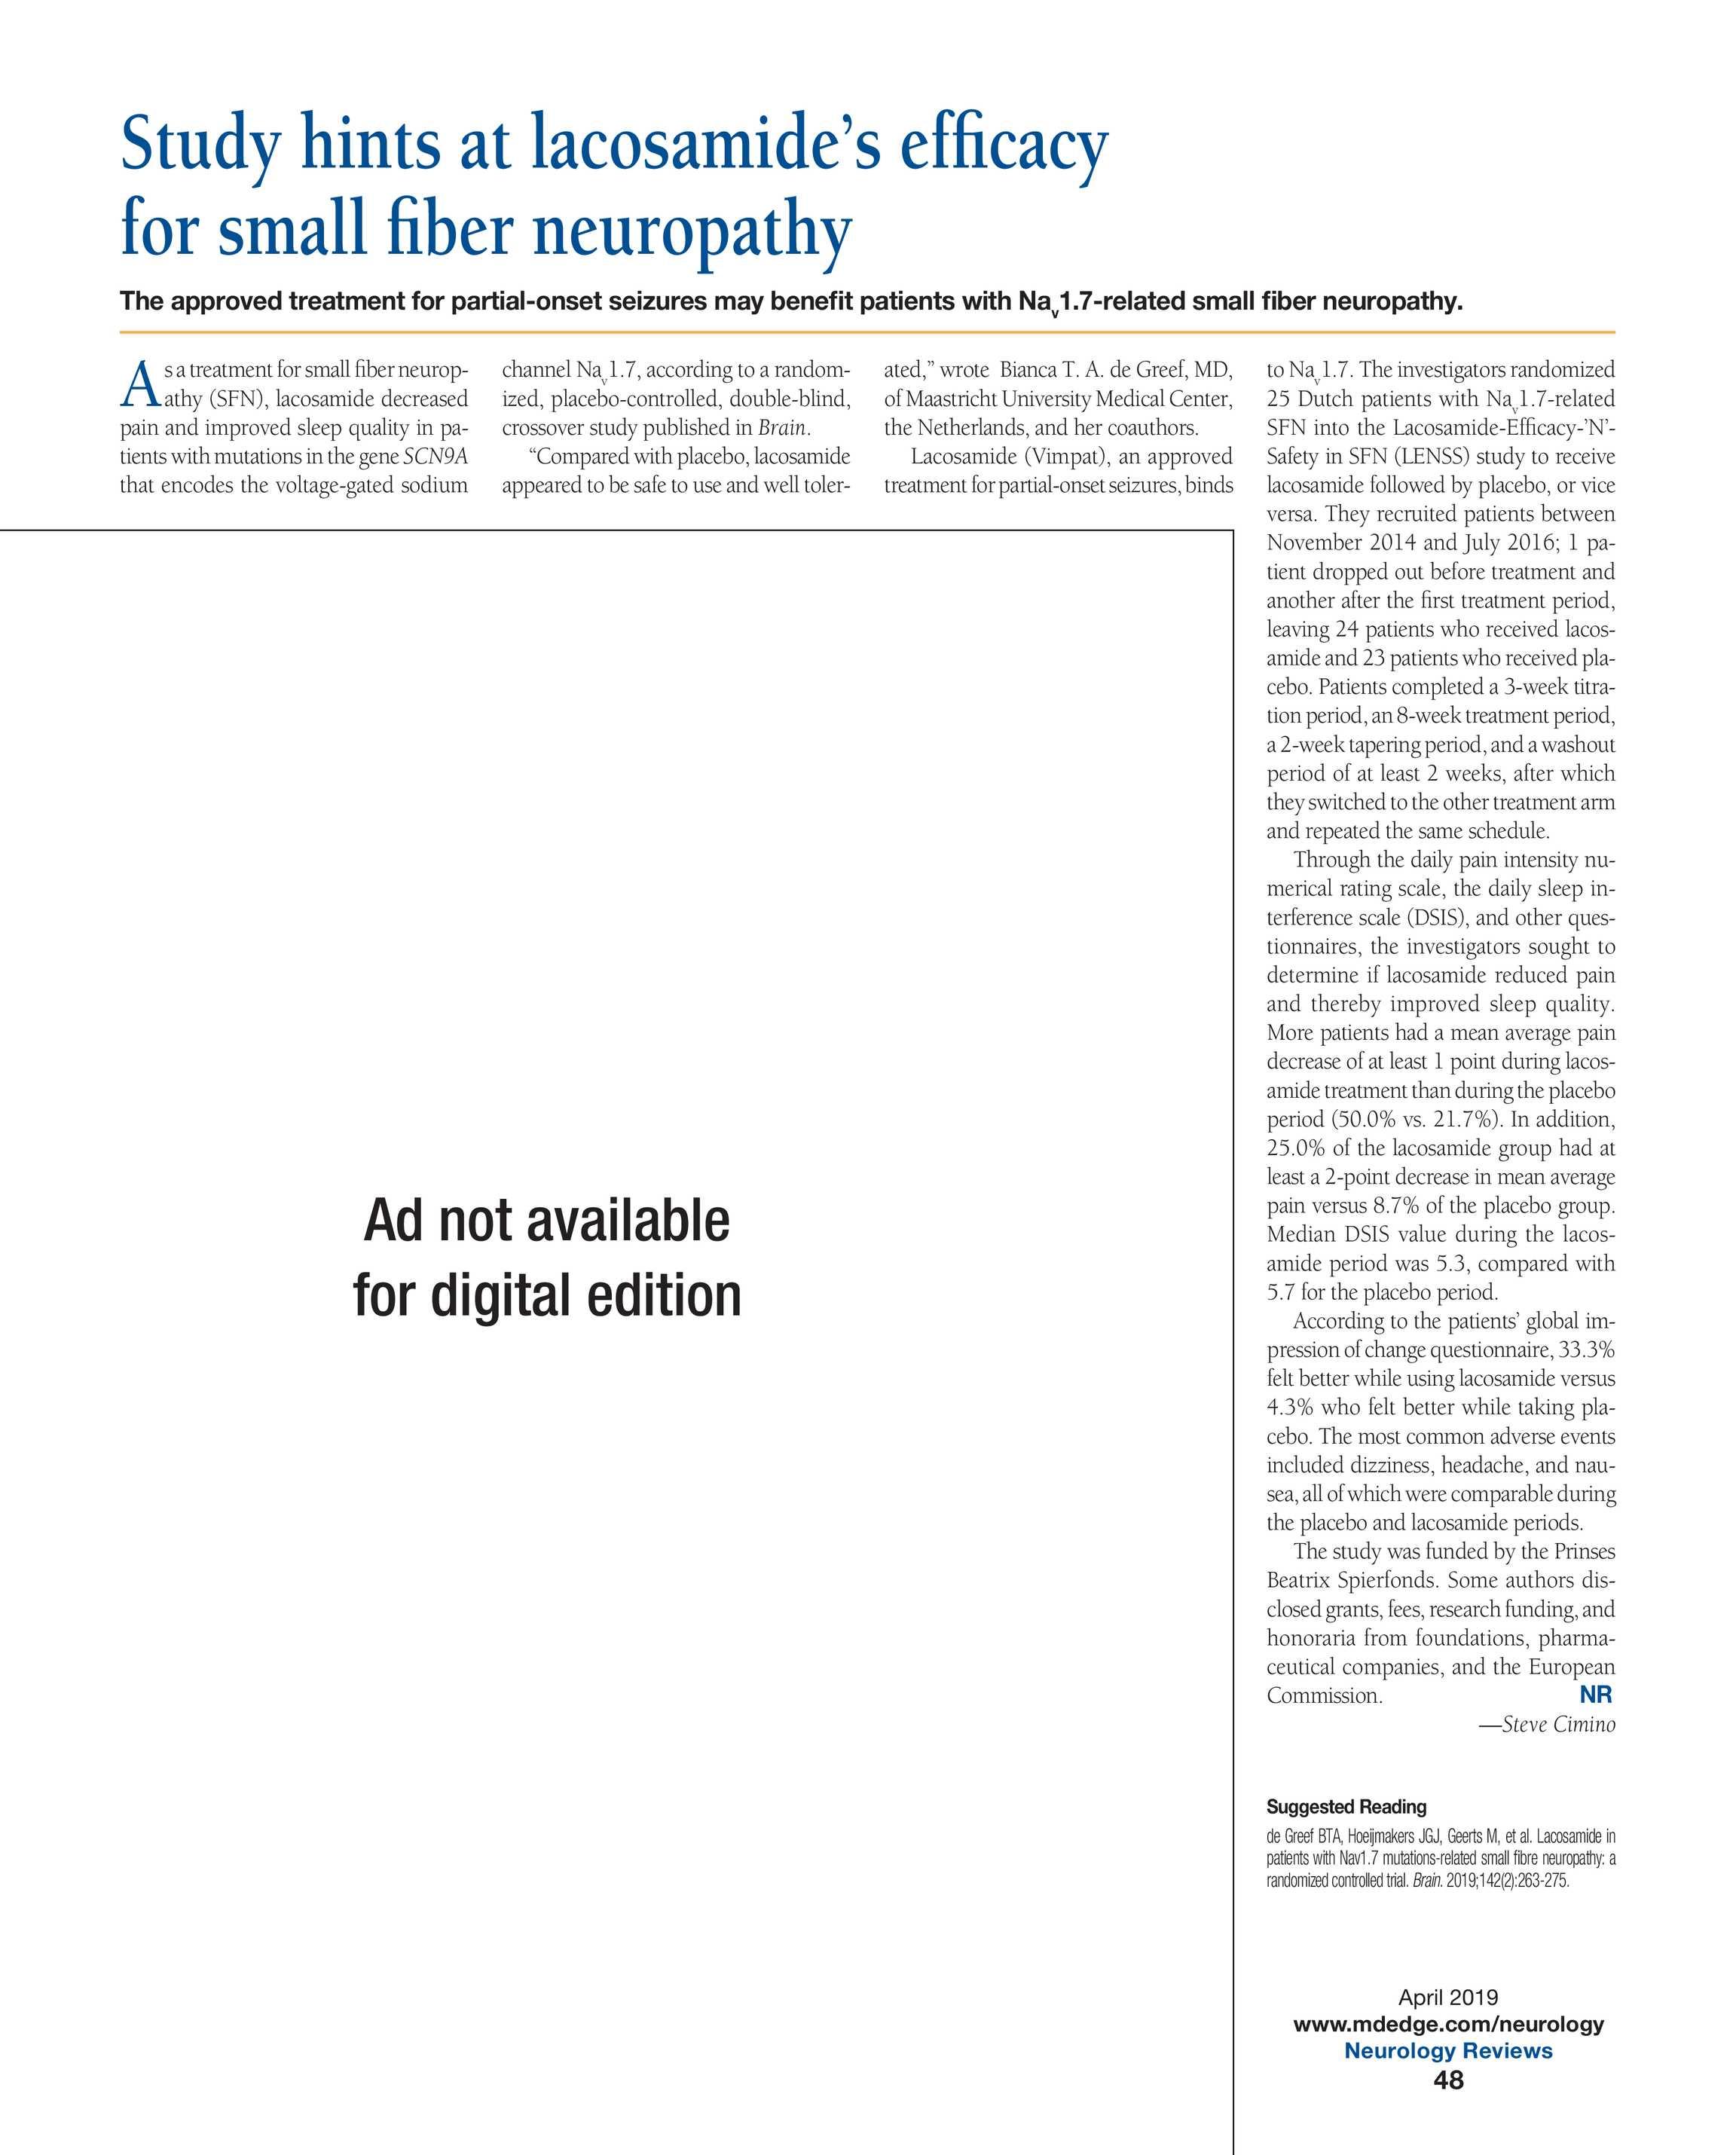 Neurology Reviews - NR APRIL 2019 - page 48